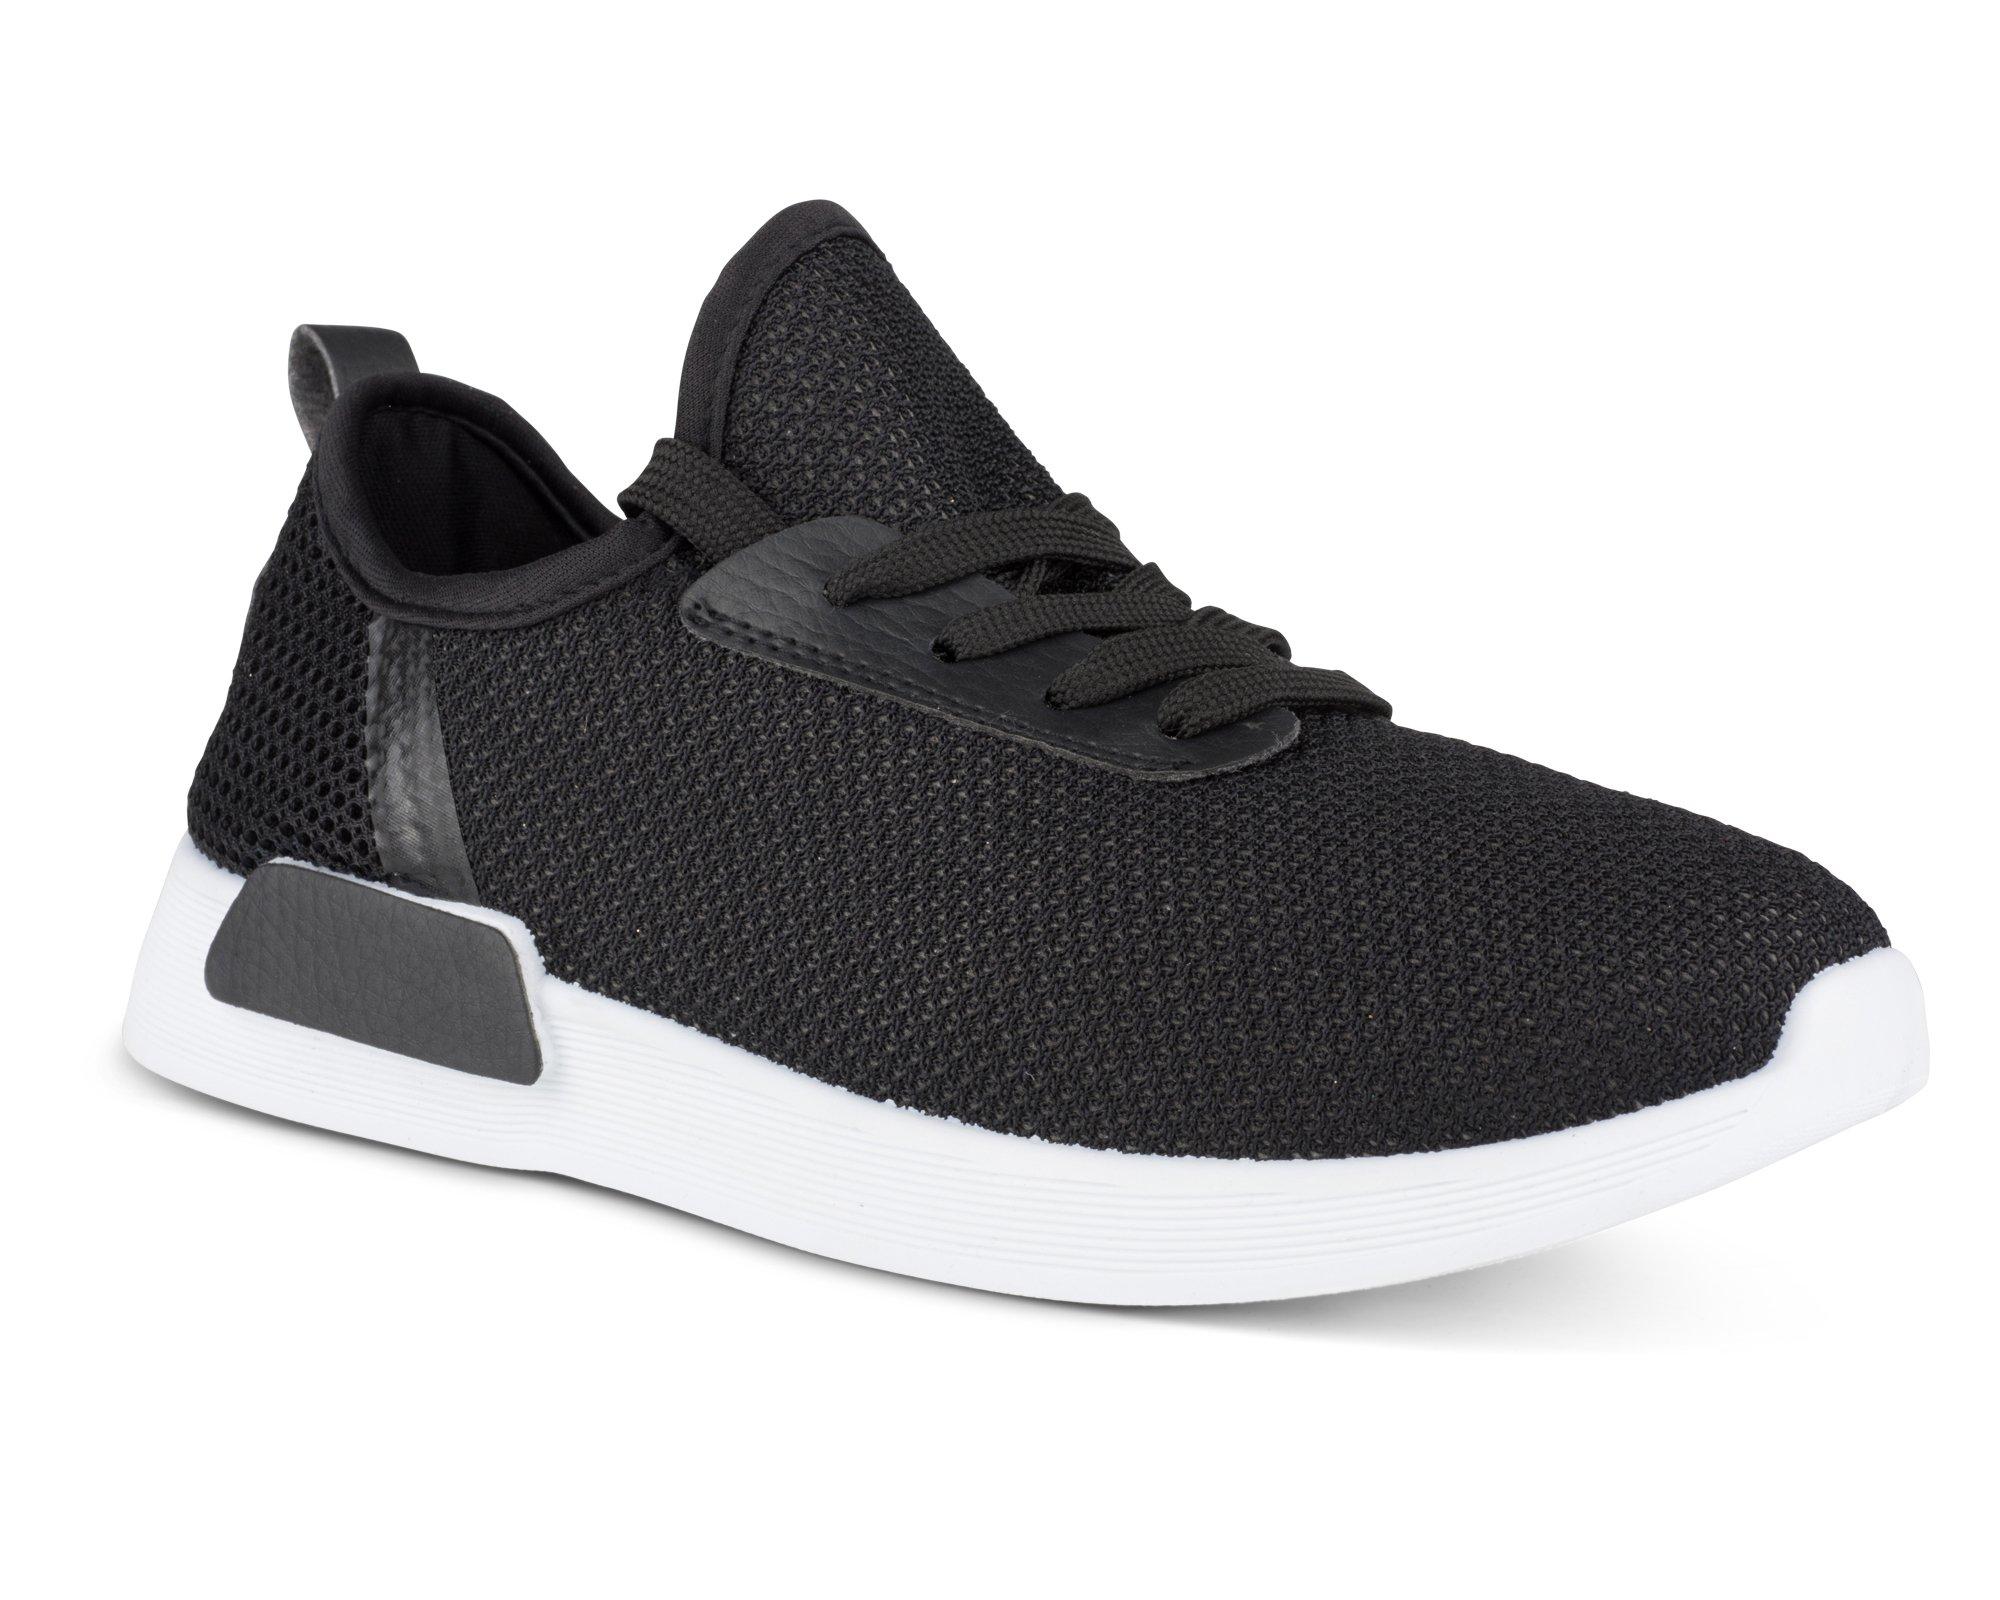 Twisted Womens Dimitria Lightweight Mesh Athletic Fashion Sneaker - DIMITRIA01 Black/White, Size 8.5